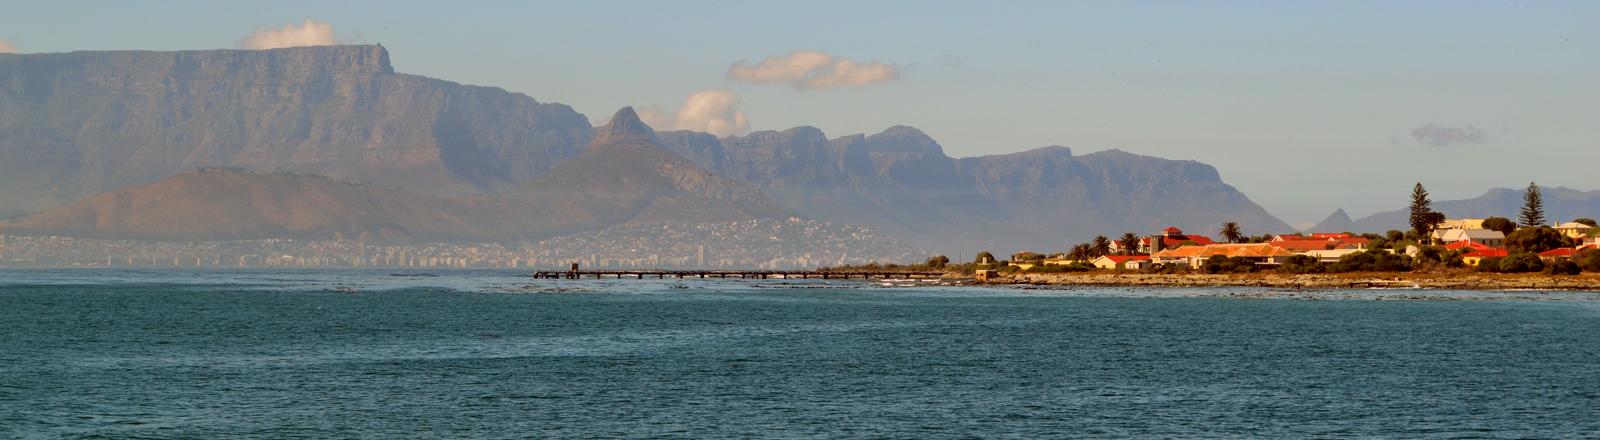 Gefängnisinsel Robben Island